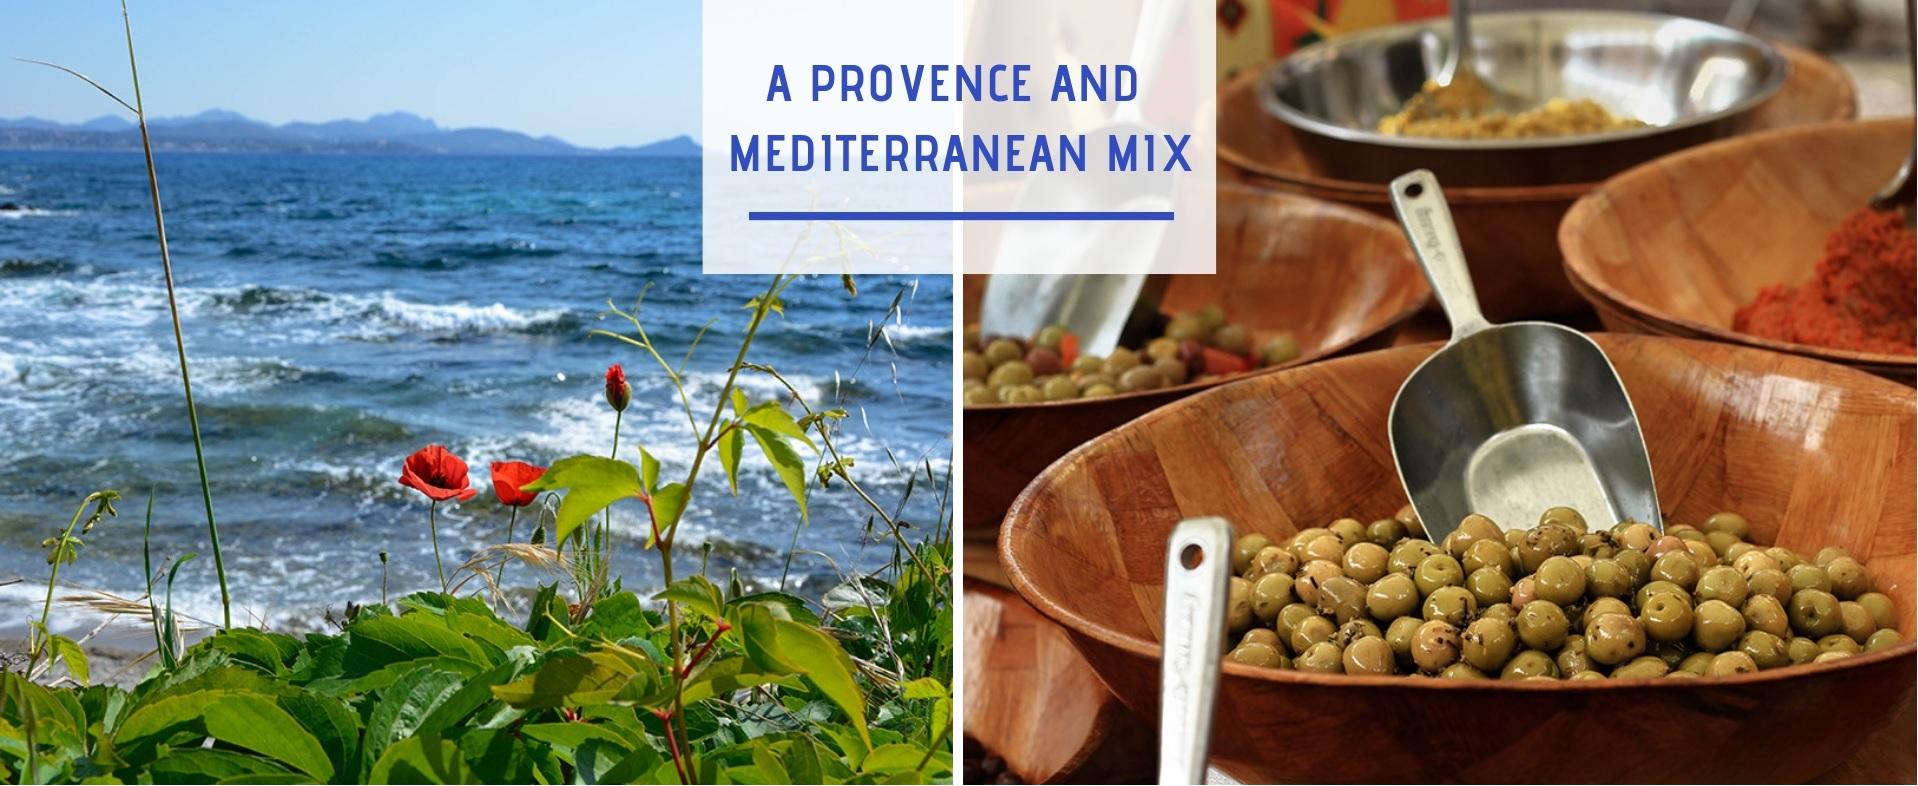 Provence mediterranee anglais